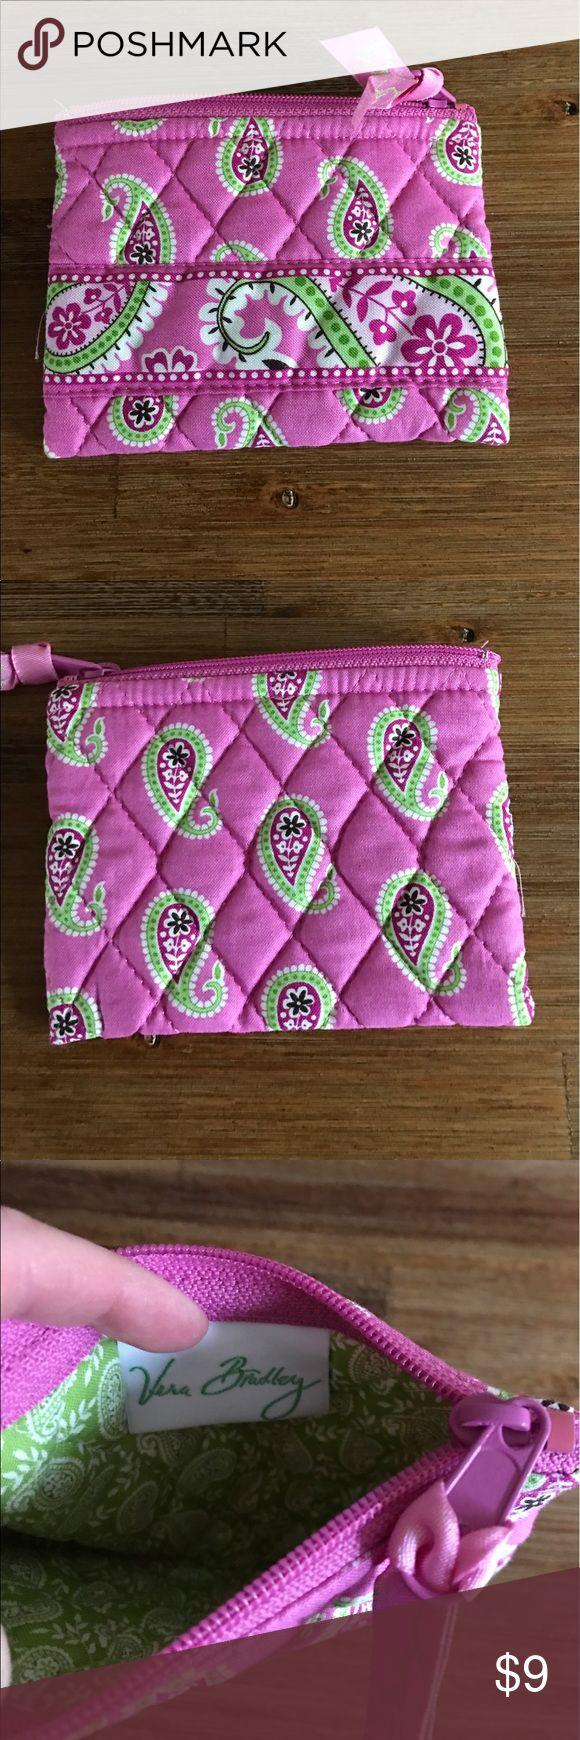 🌷SALE🌼 Vera Bradley Bermuda Pink Coin Purse Vera Bradley coin purse in retired pattern Bermuda pink used twice in excellent condition.  ‼ NO TRADES ‼ Vera Bradley Accessories